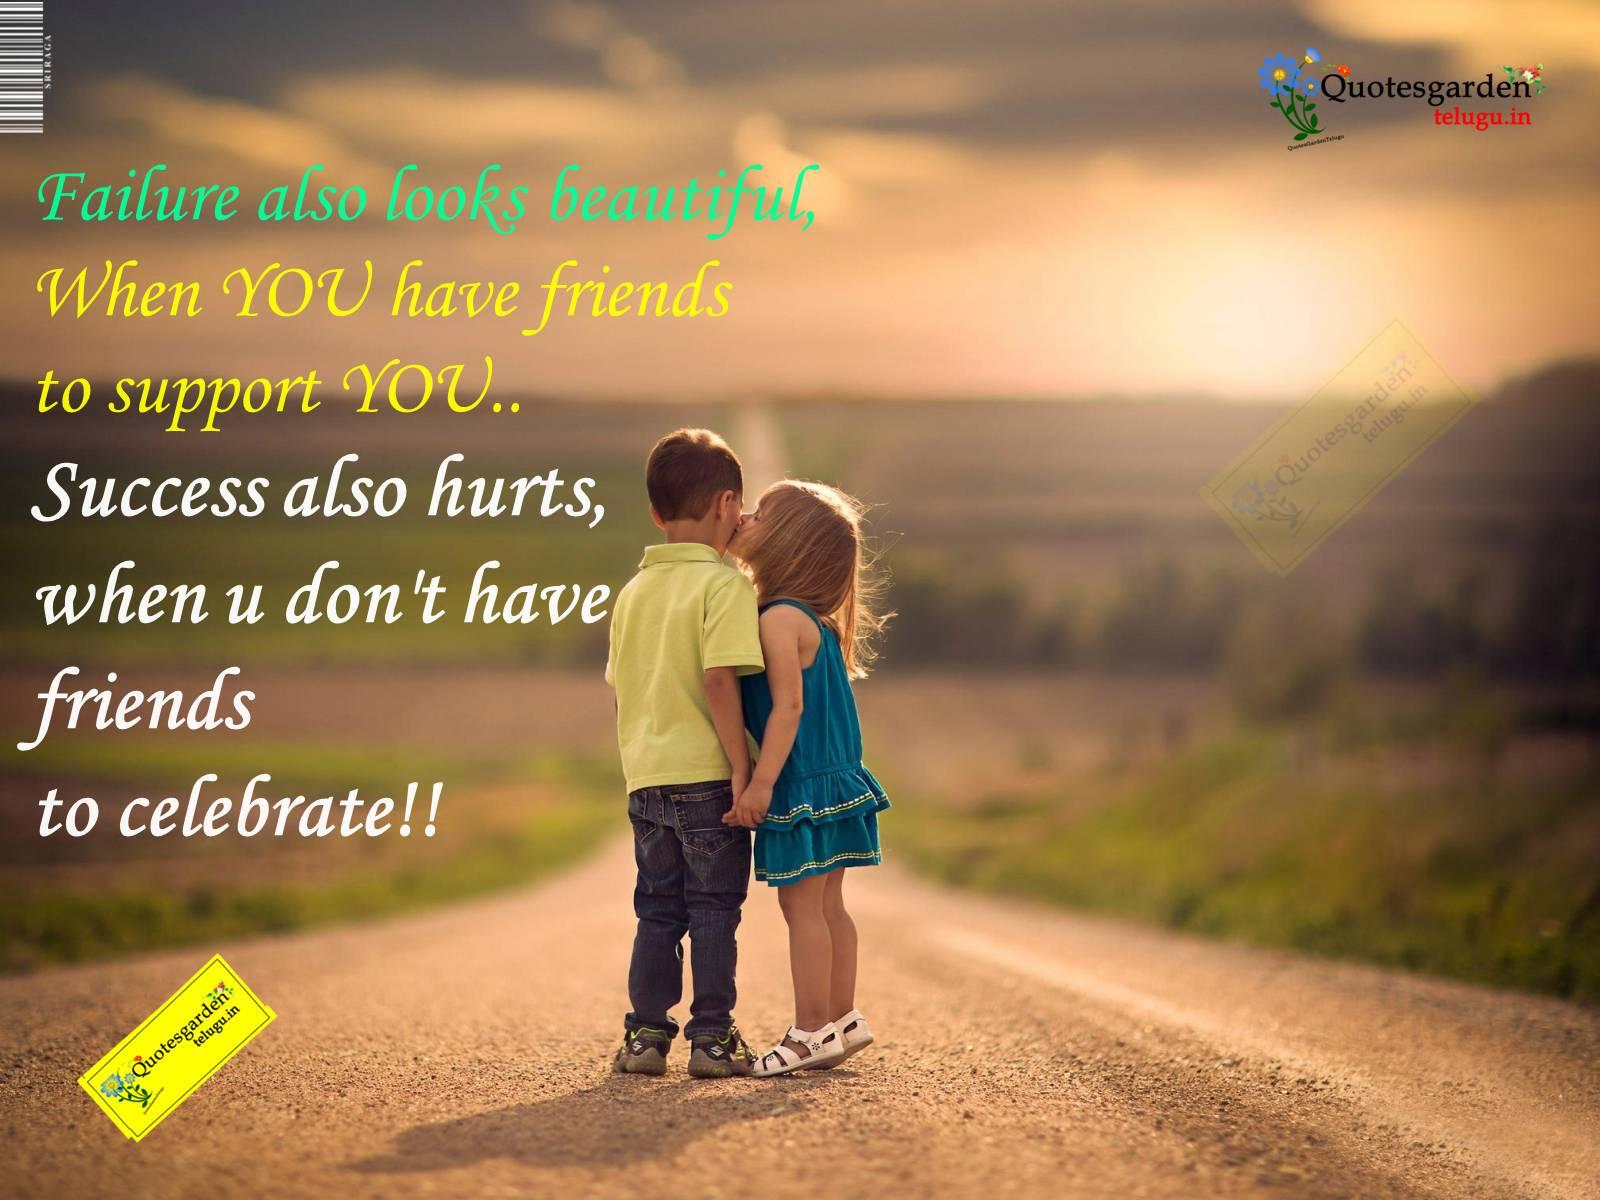 Latest Trending Heart Touching Friendship Quotes 648 Quotes Garden Telugu Telugu Quotes English Quotes Hindi Quotes